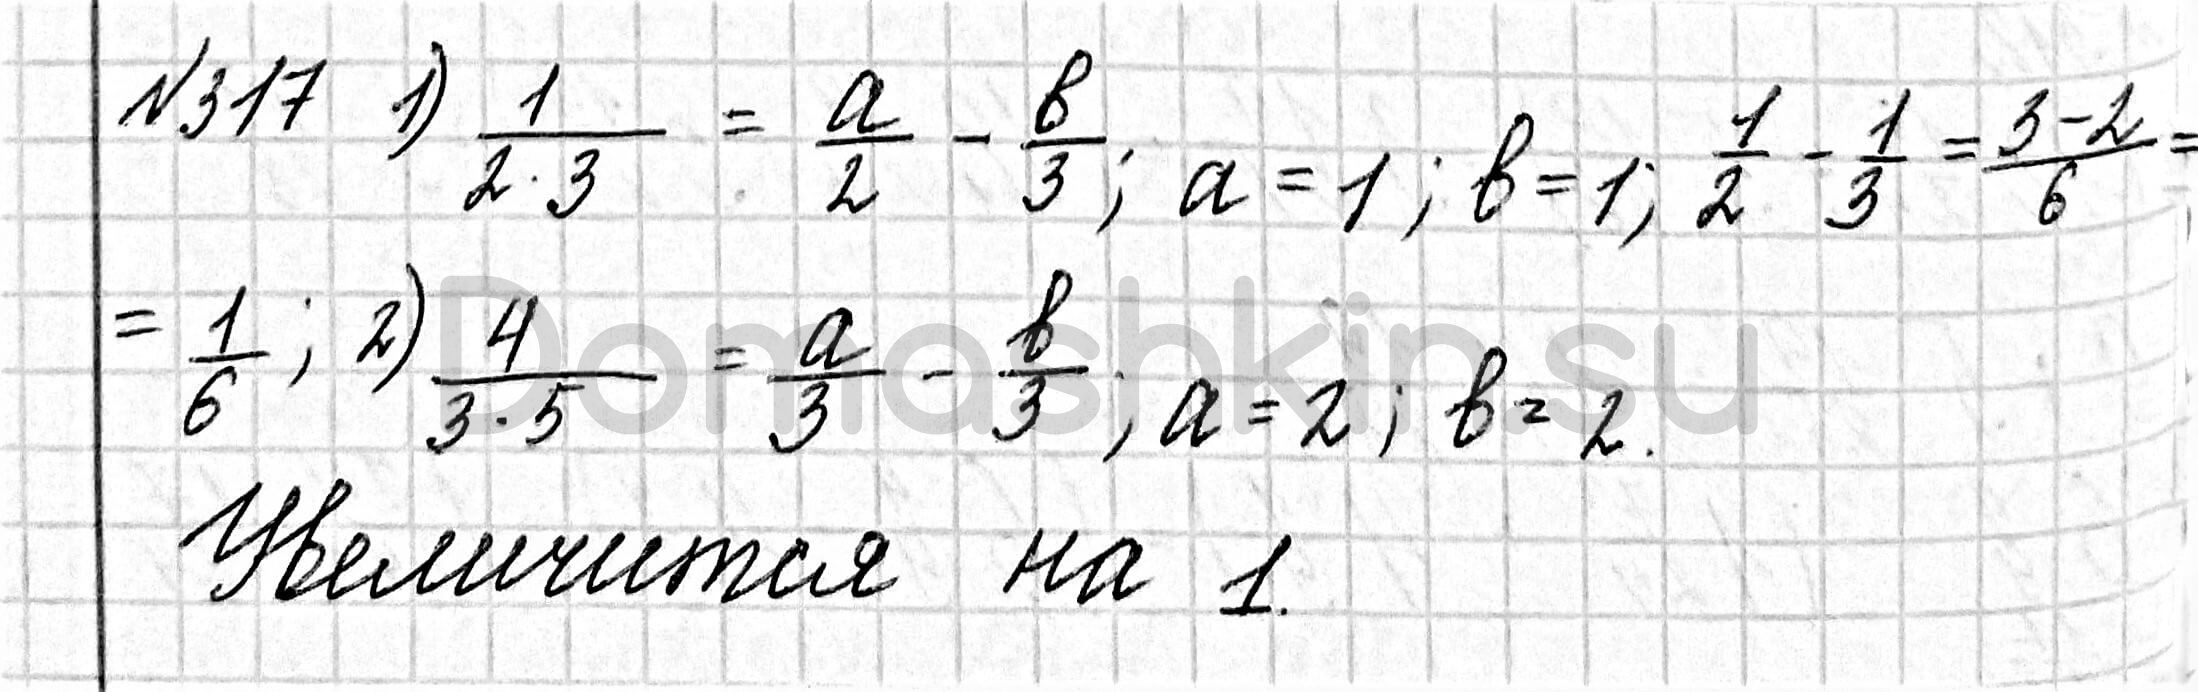 Математика 6 класс учебник Мерзляк номер 317 решение